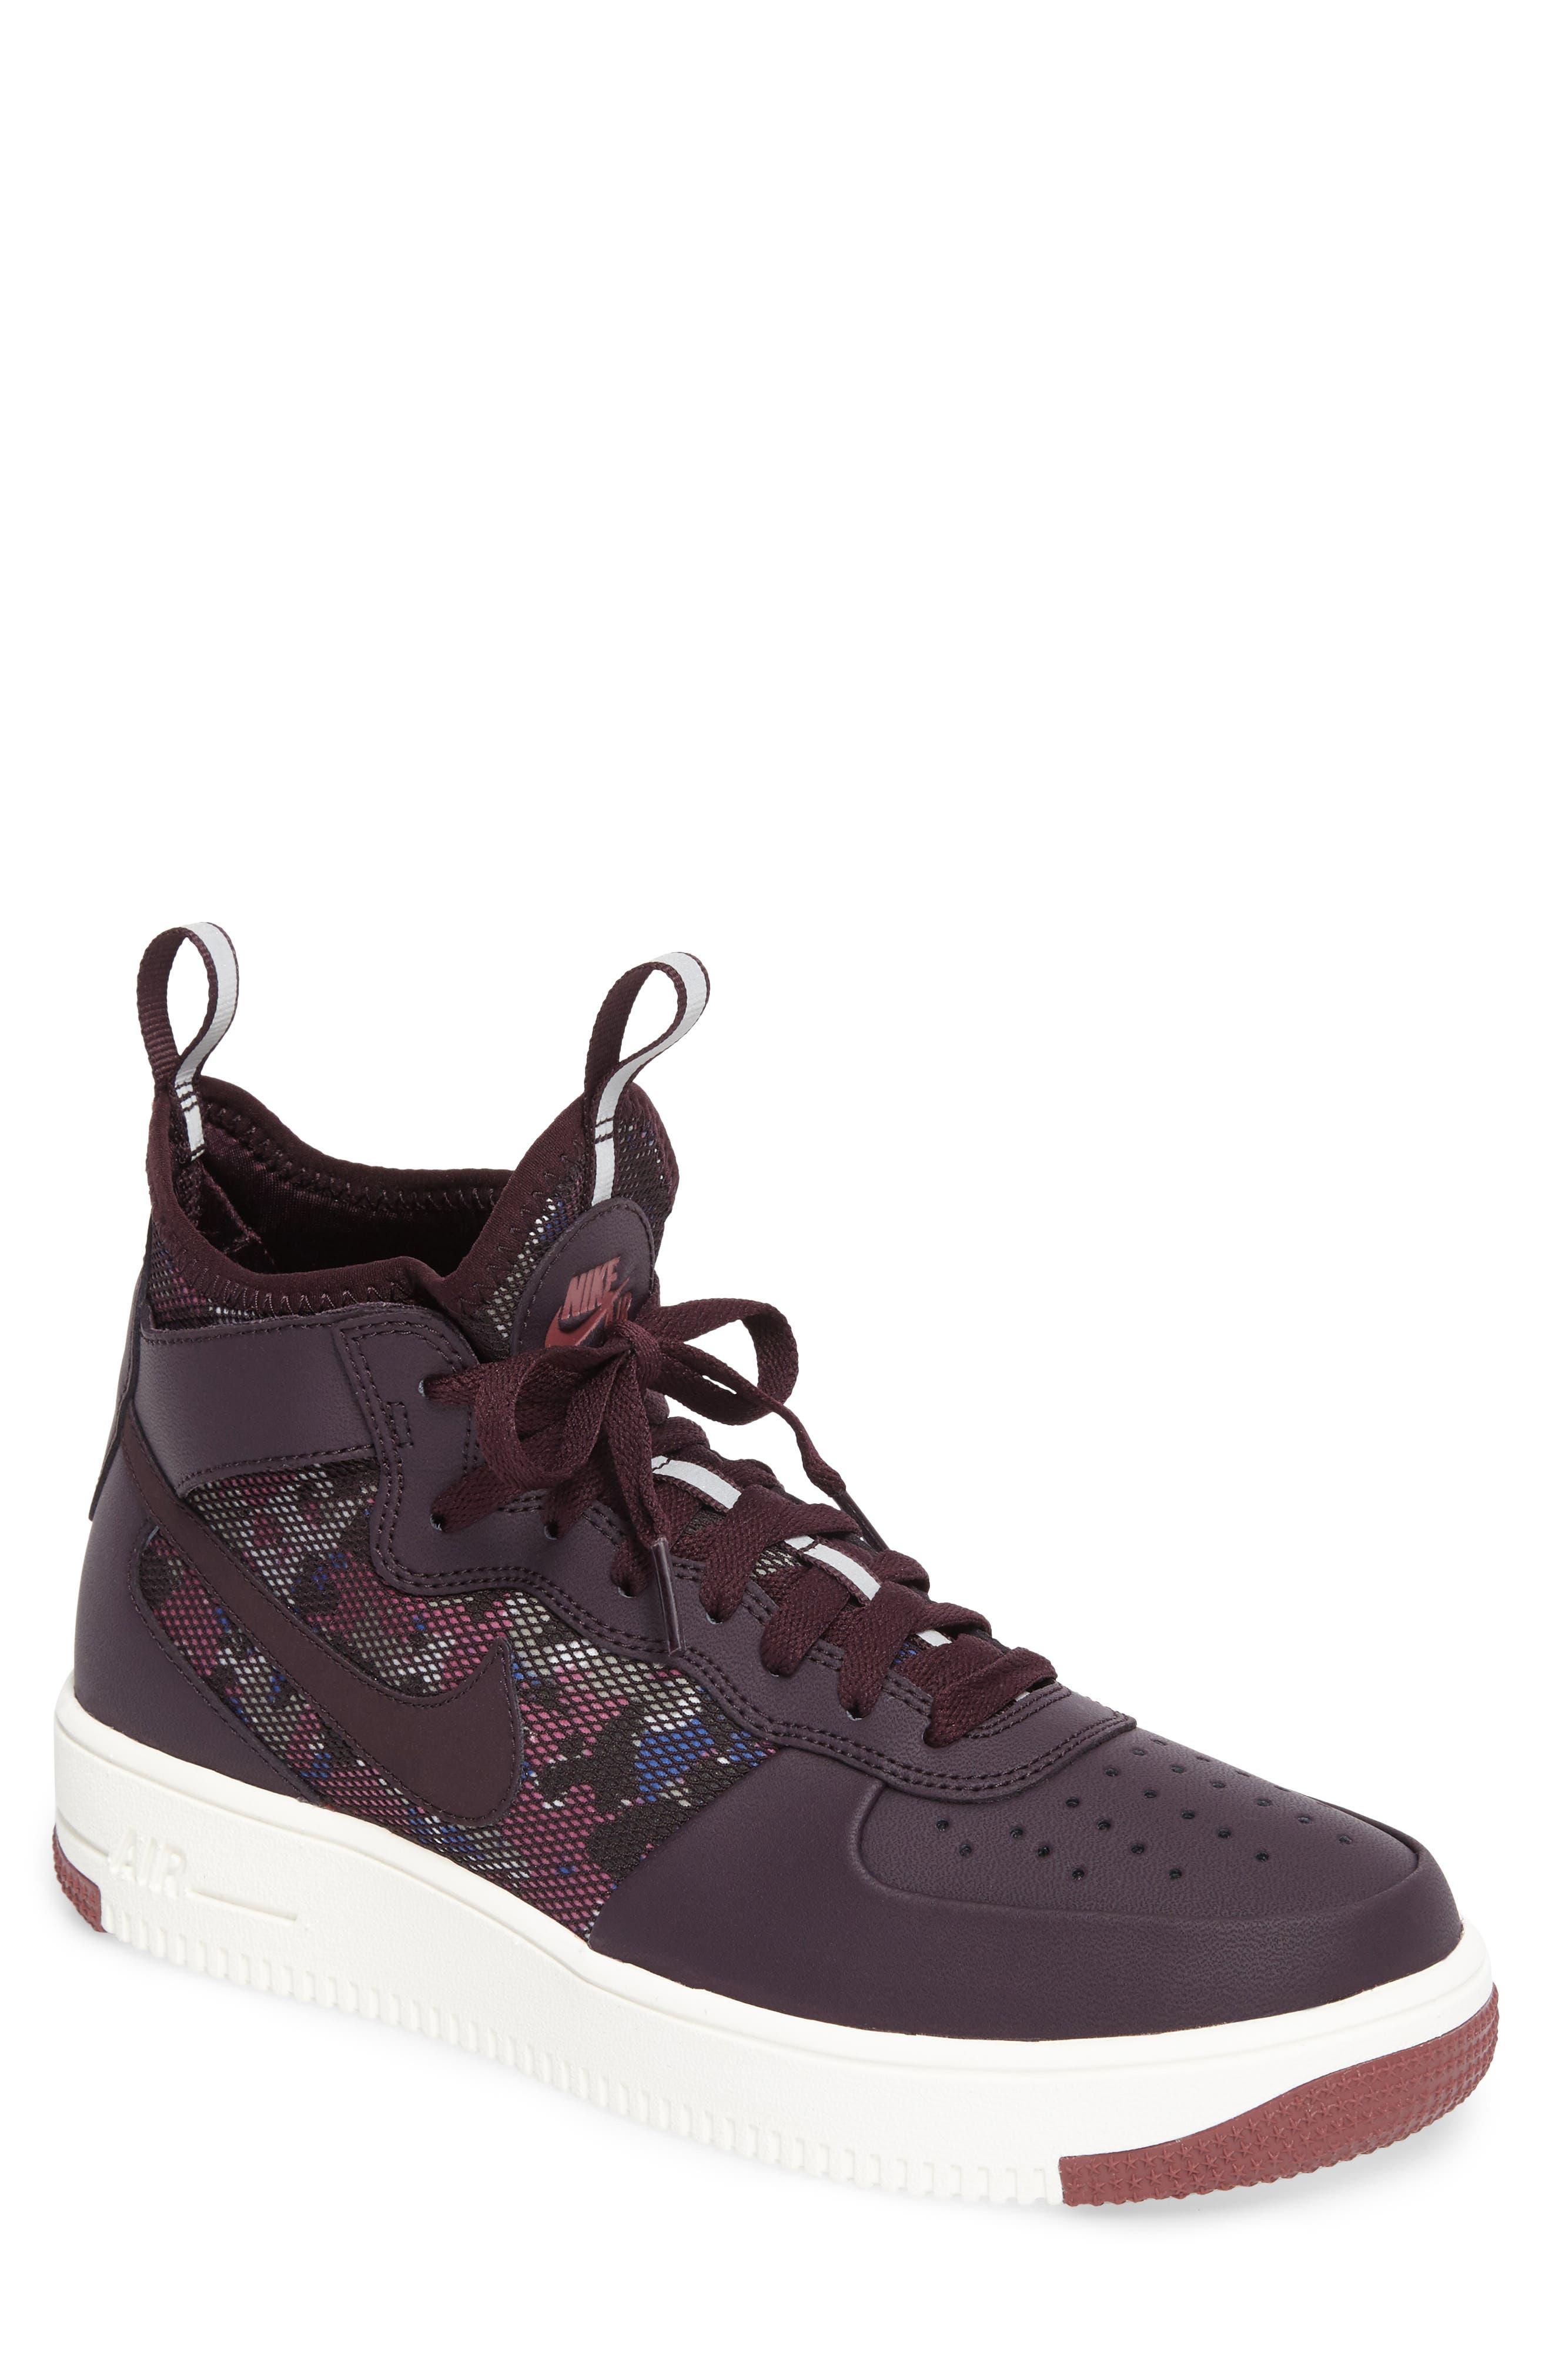 Cheap New Arrivals MM33' High Top Sneaker Men Mens Port Blackstone Mens Sneakers Athletic